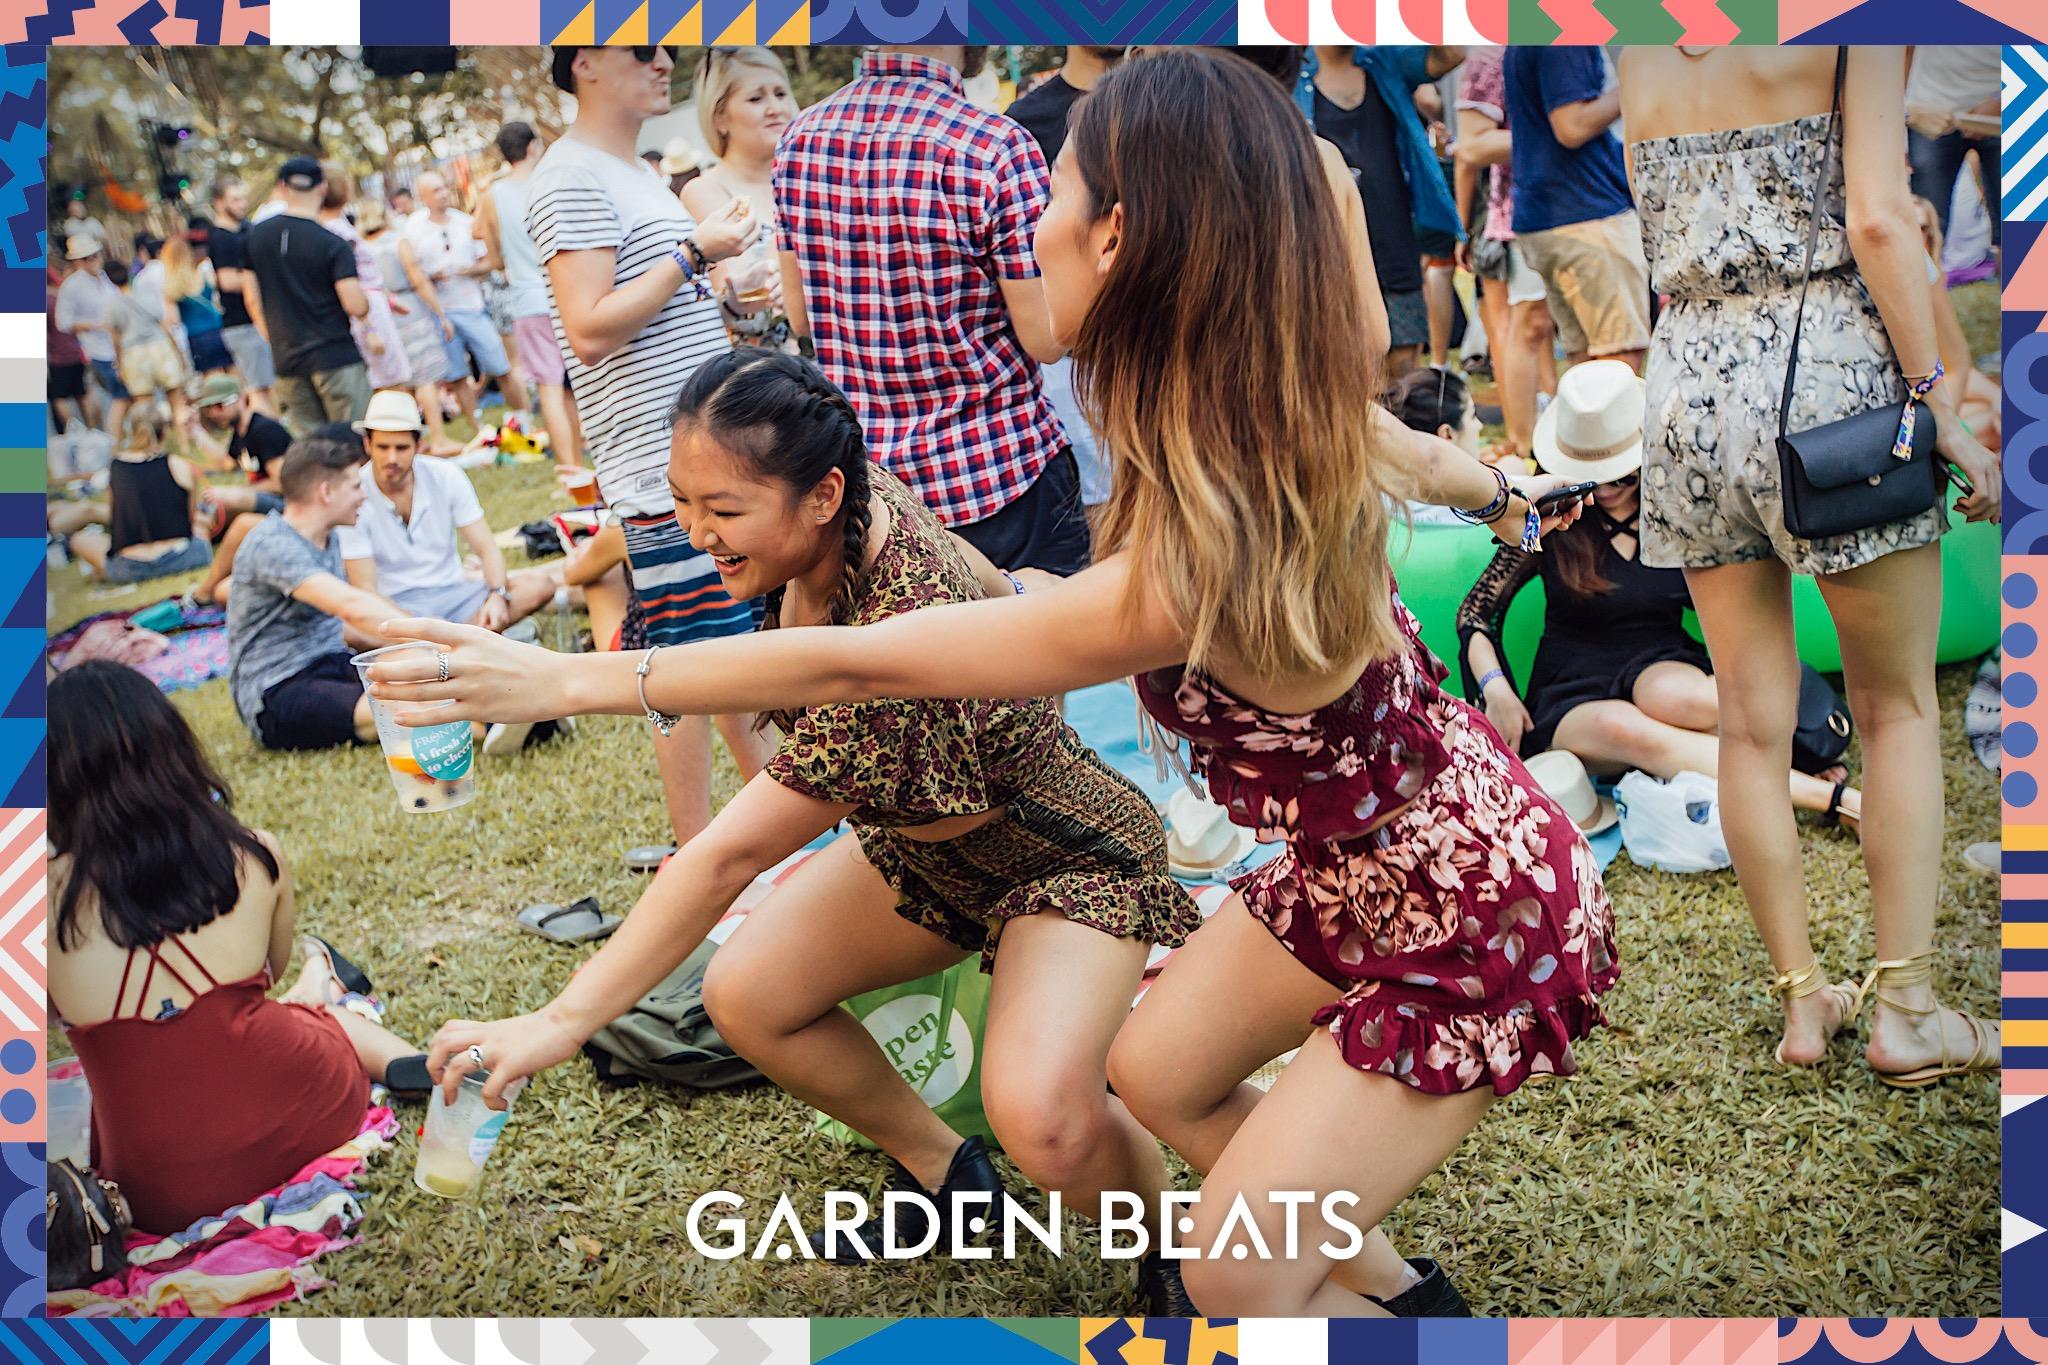 18032017_GardenBeats_Colossal556_WatermarkedGB.jpg